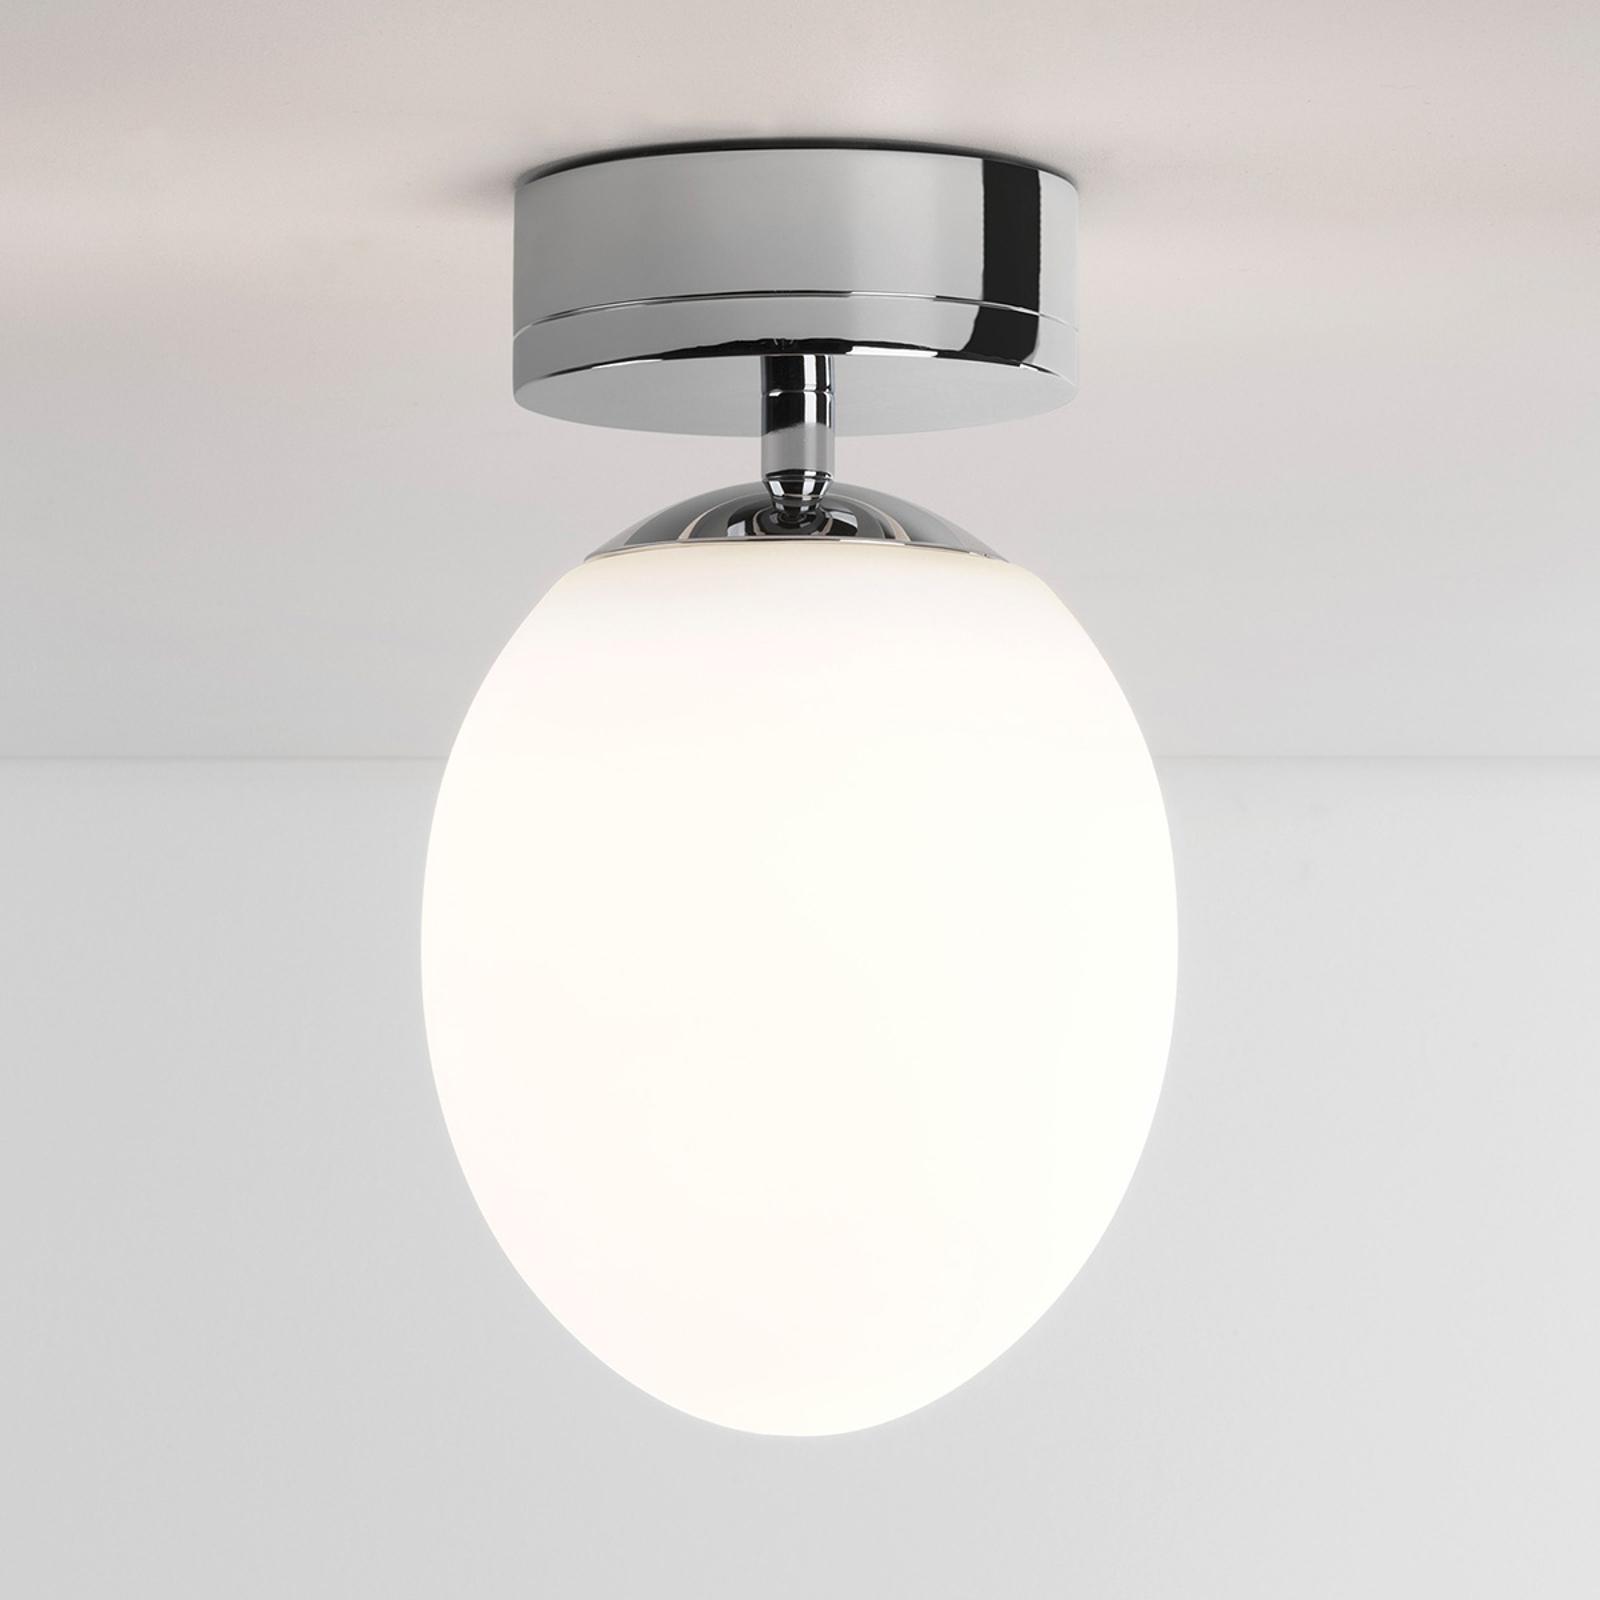 Astro Kiwi LED-Deckenleuchte fürs Bad chrom